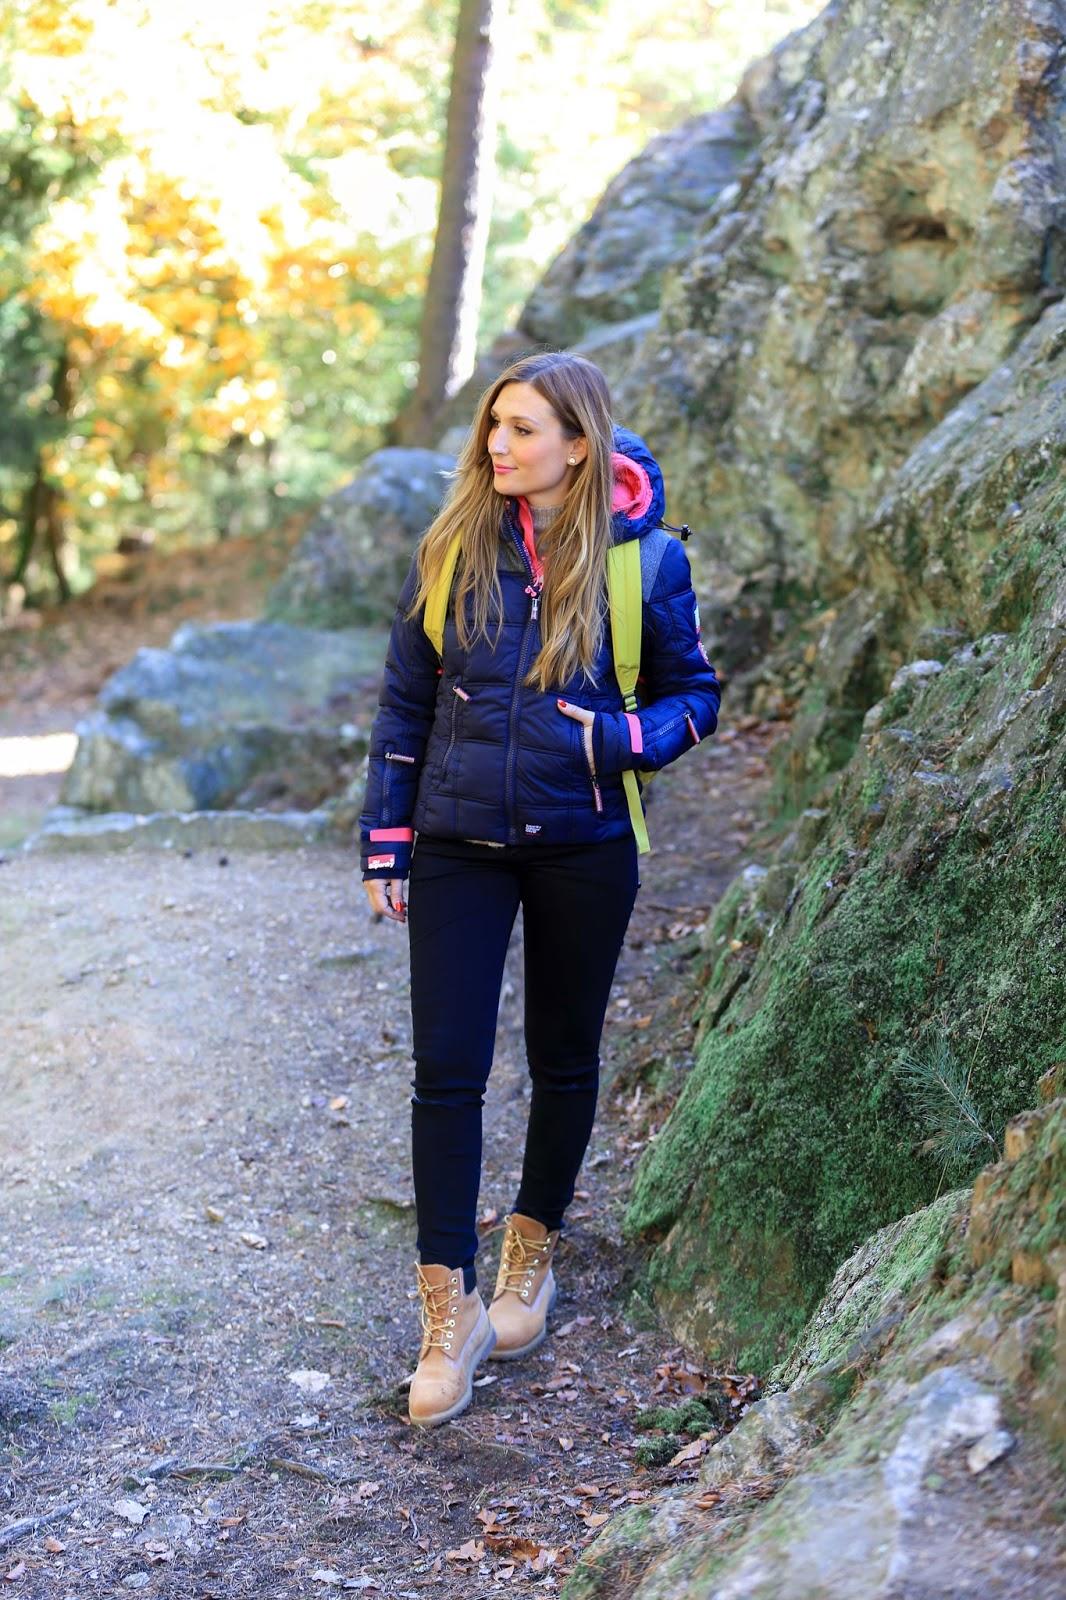 Hiking-Wandern-wanderlook-wander-outfit-Outdoorblogger-fashionstylebyjohanna-timberland-schuhe-Fashionstylebyjohanna